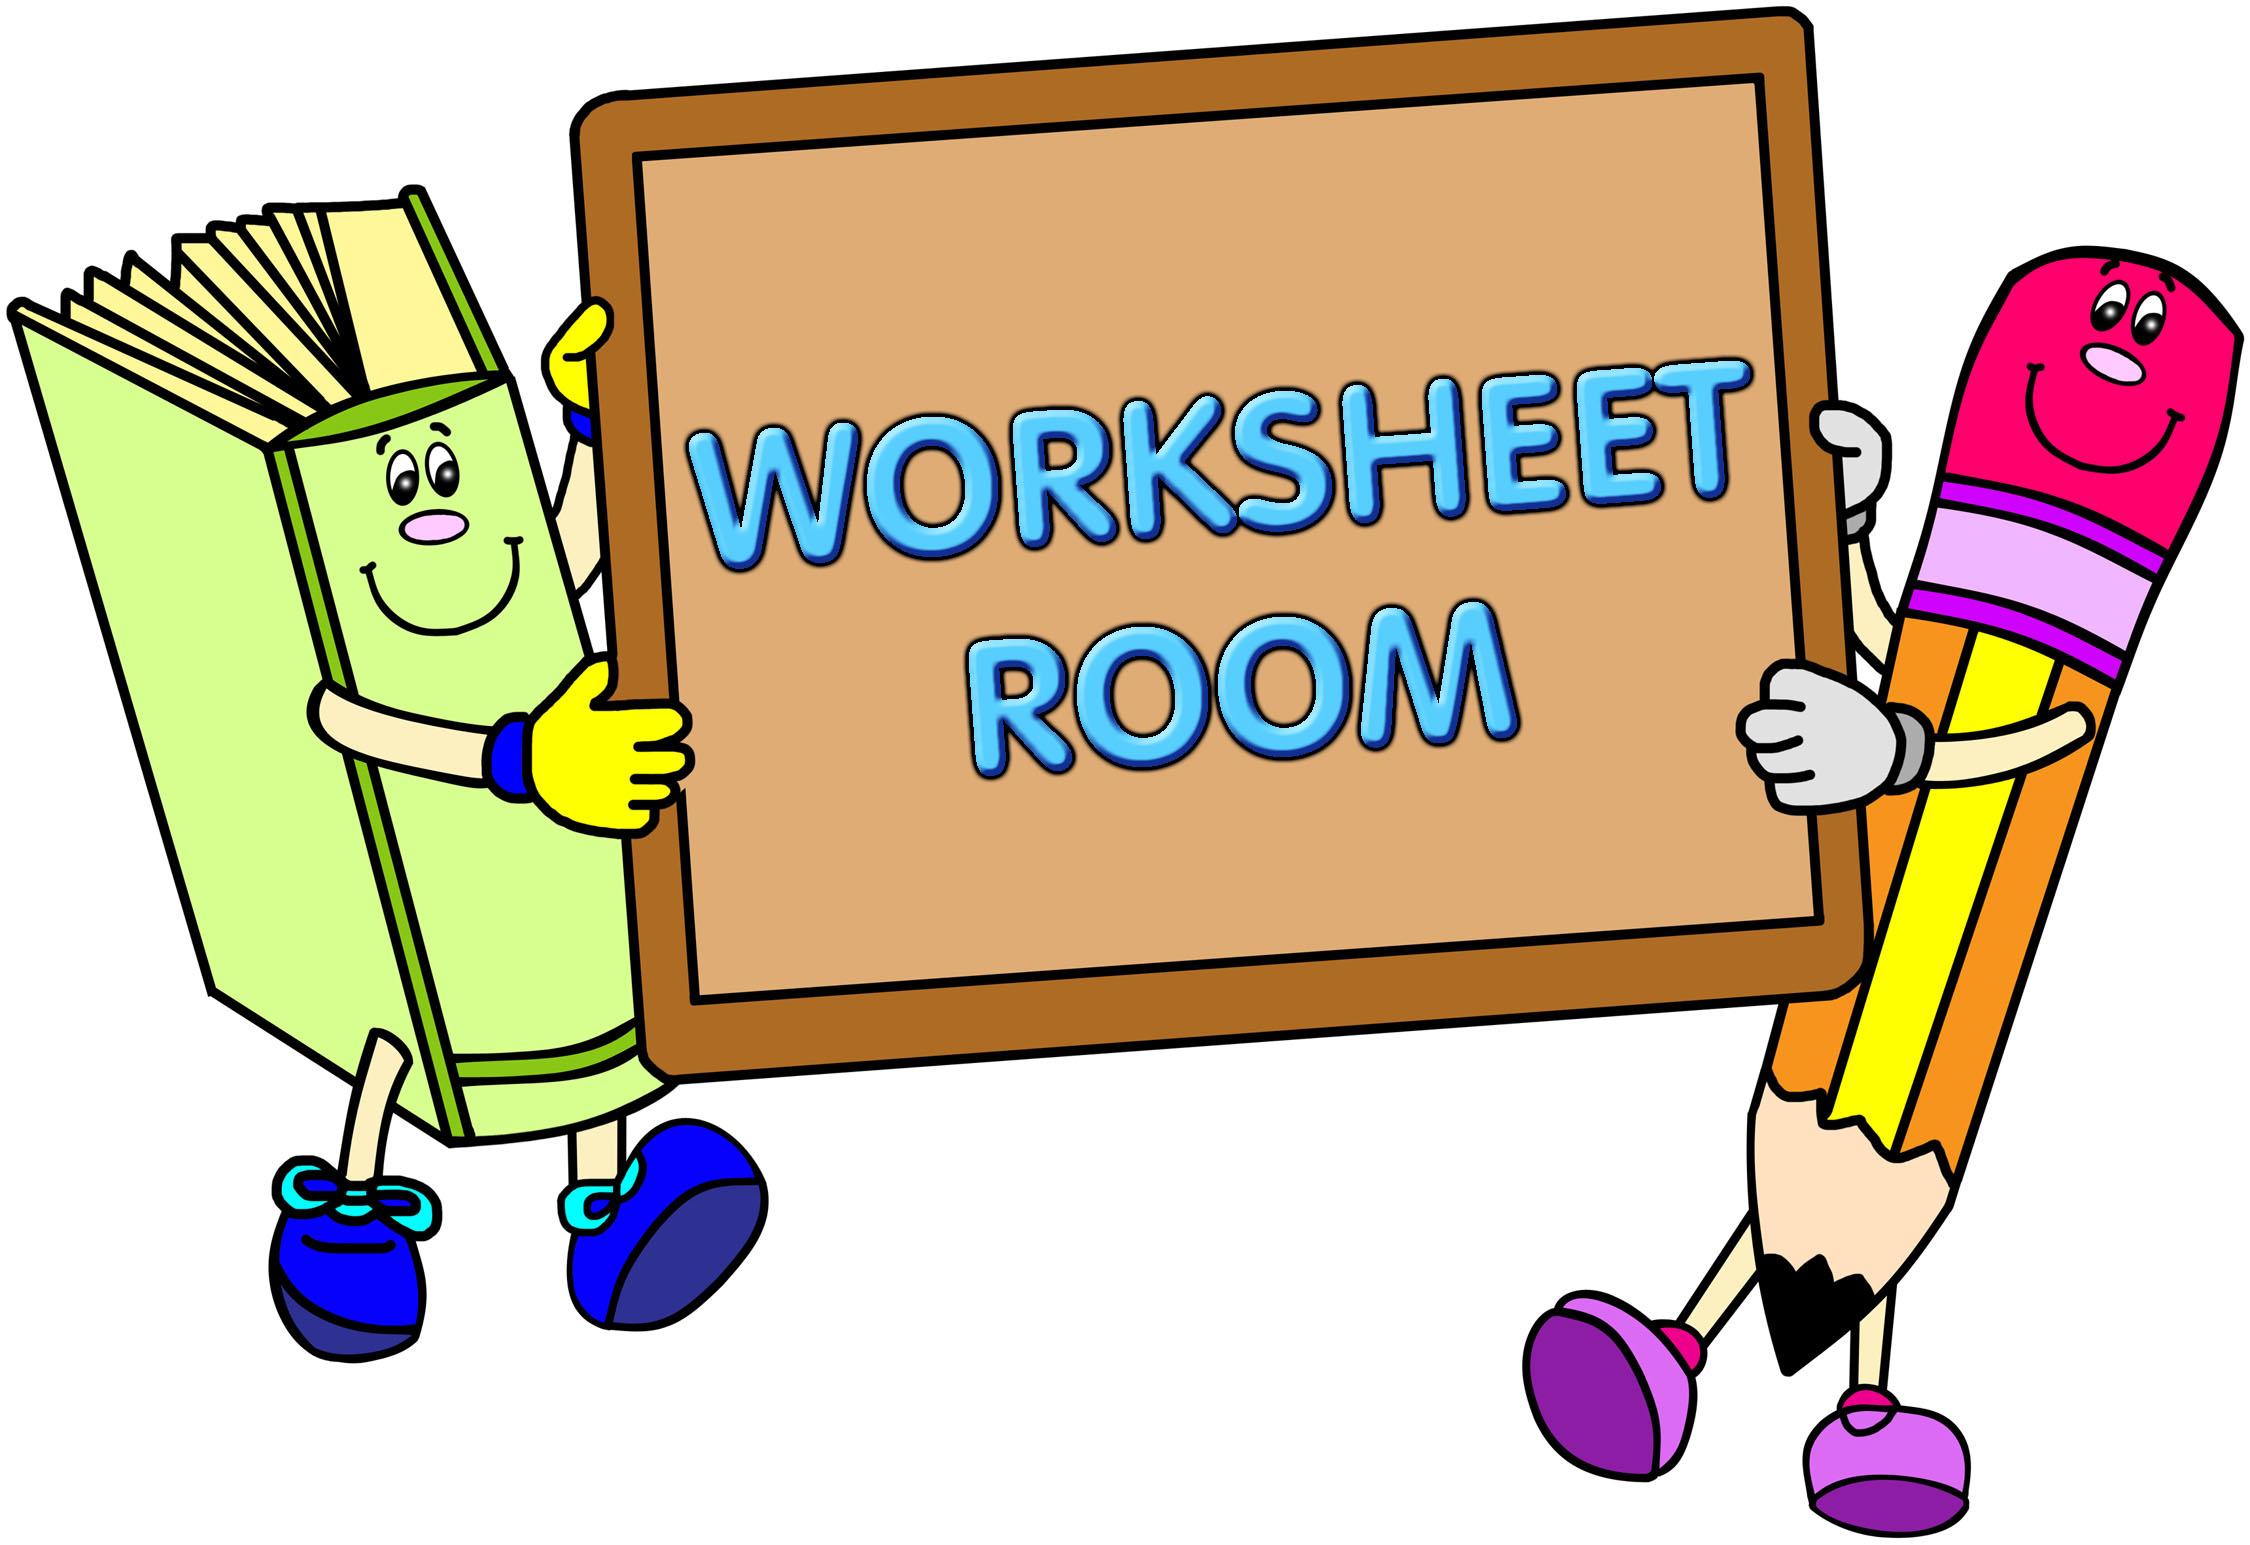 Worksheet Clip Art : Clipart worksheet at getdrawings free for personal